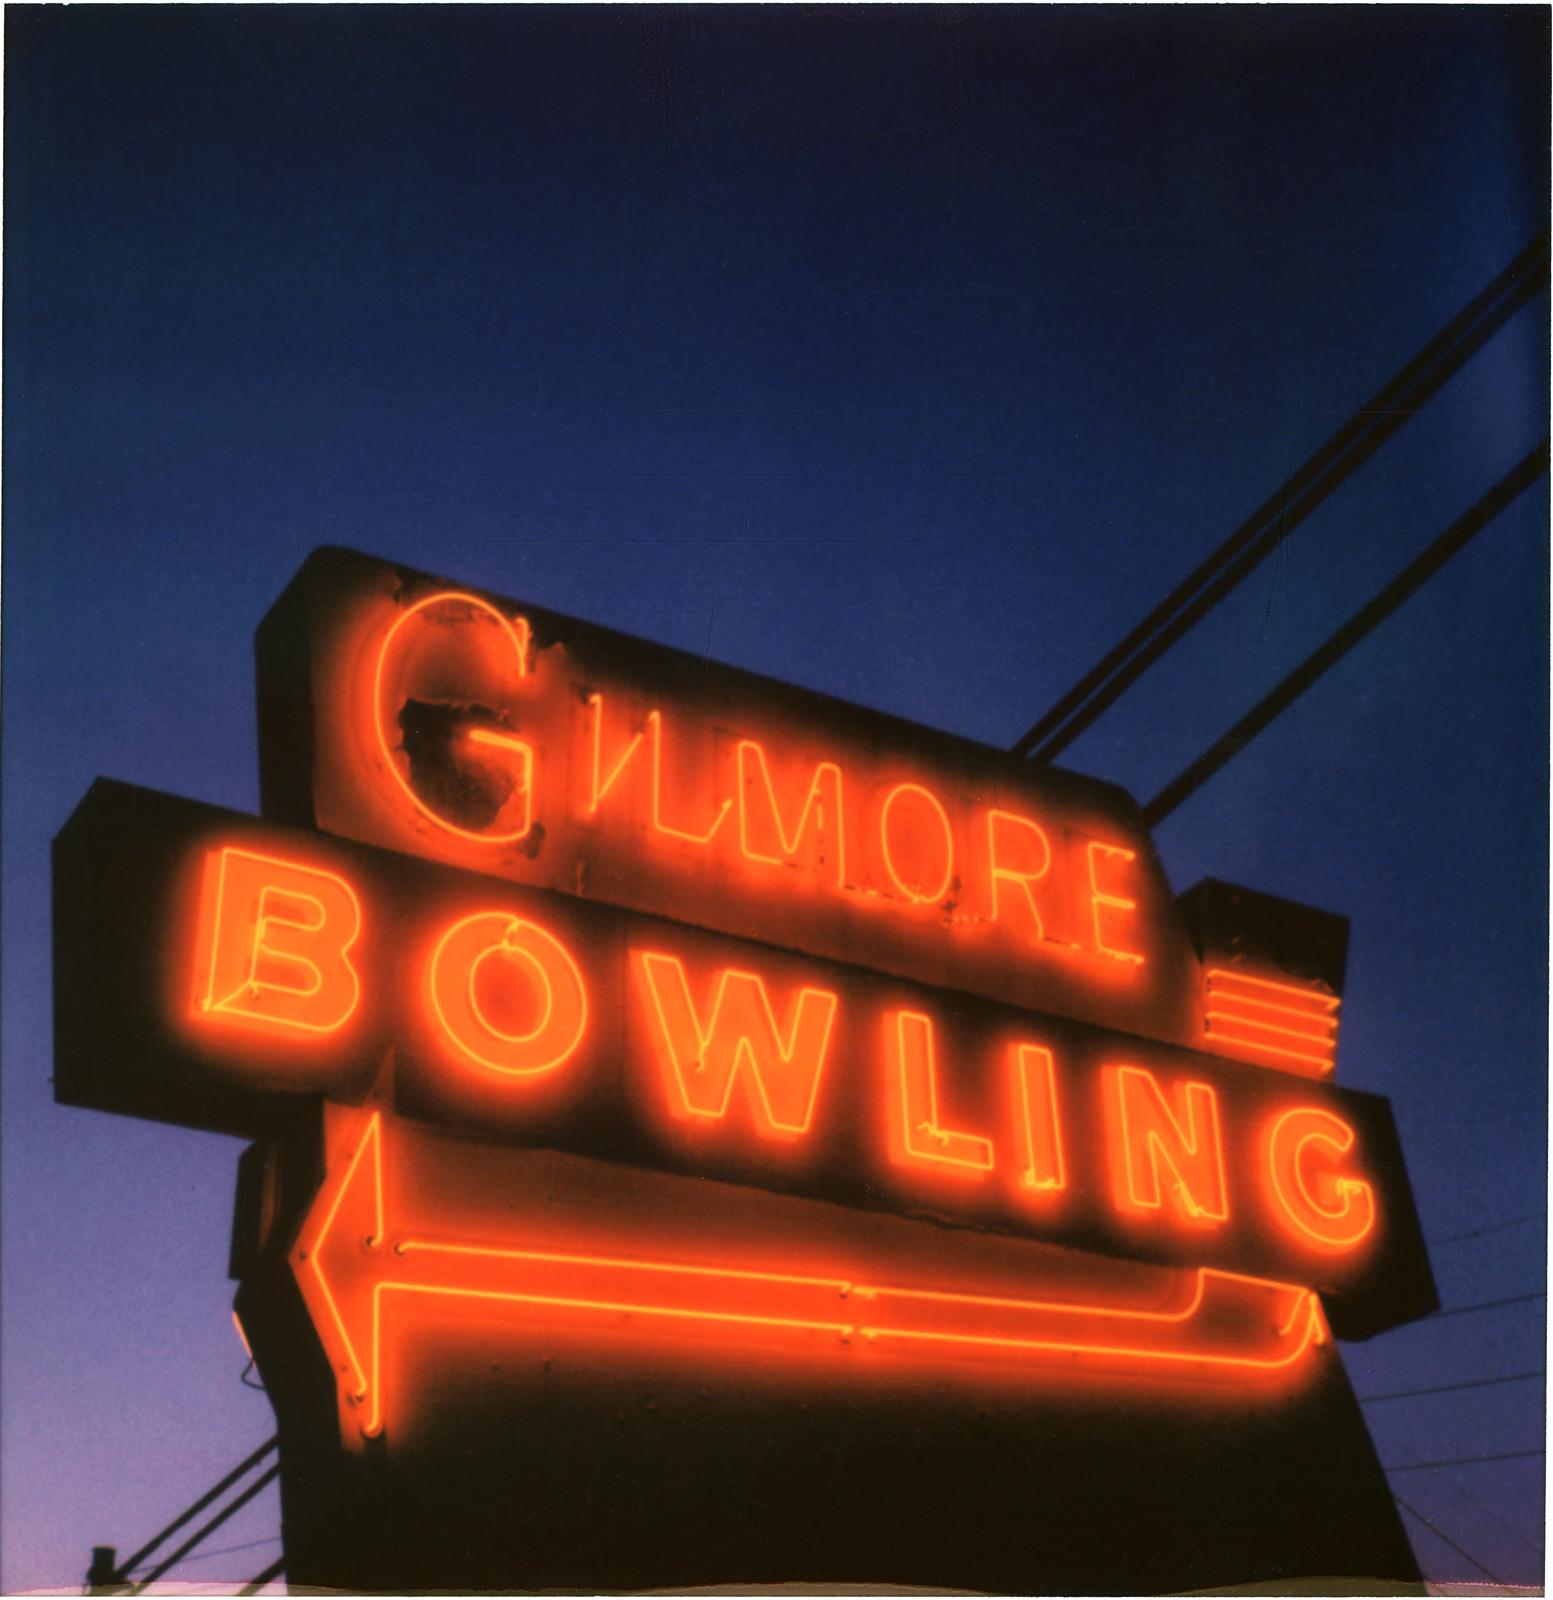 Gilmore Bowling